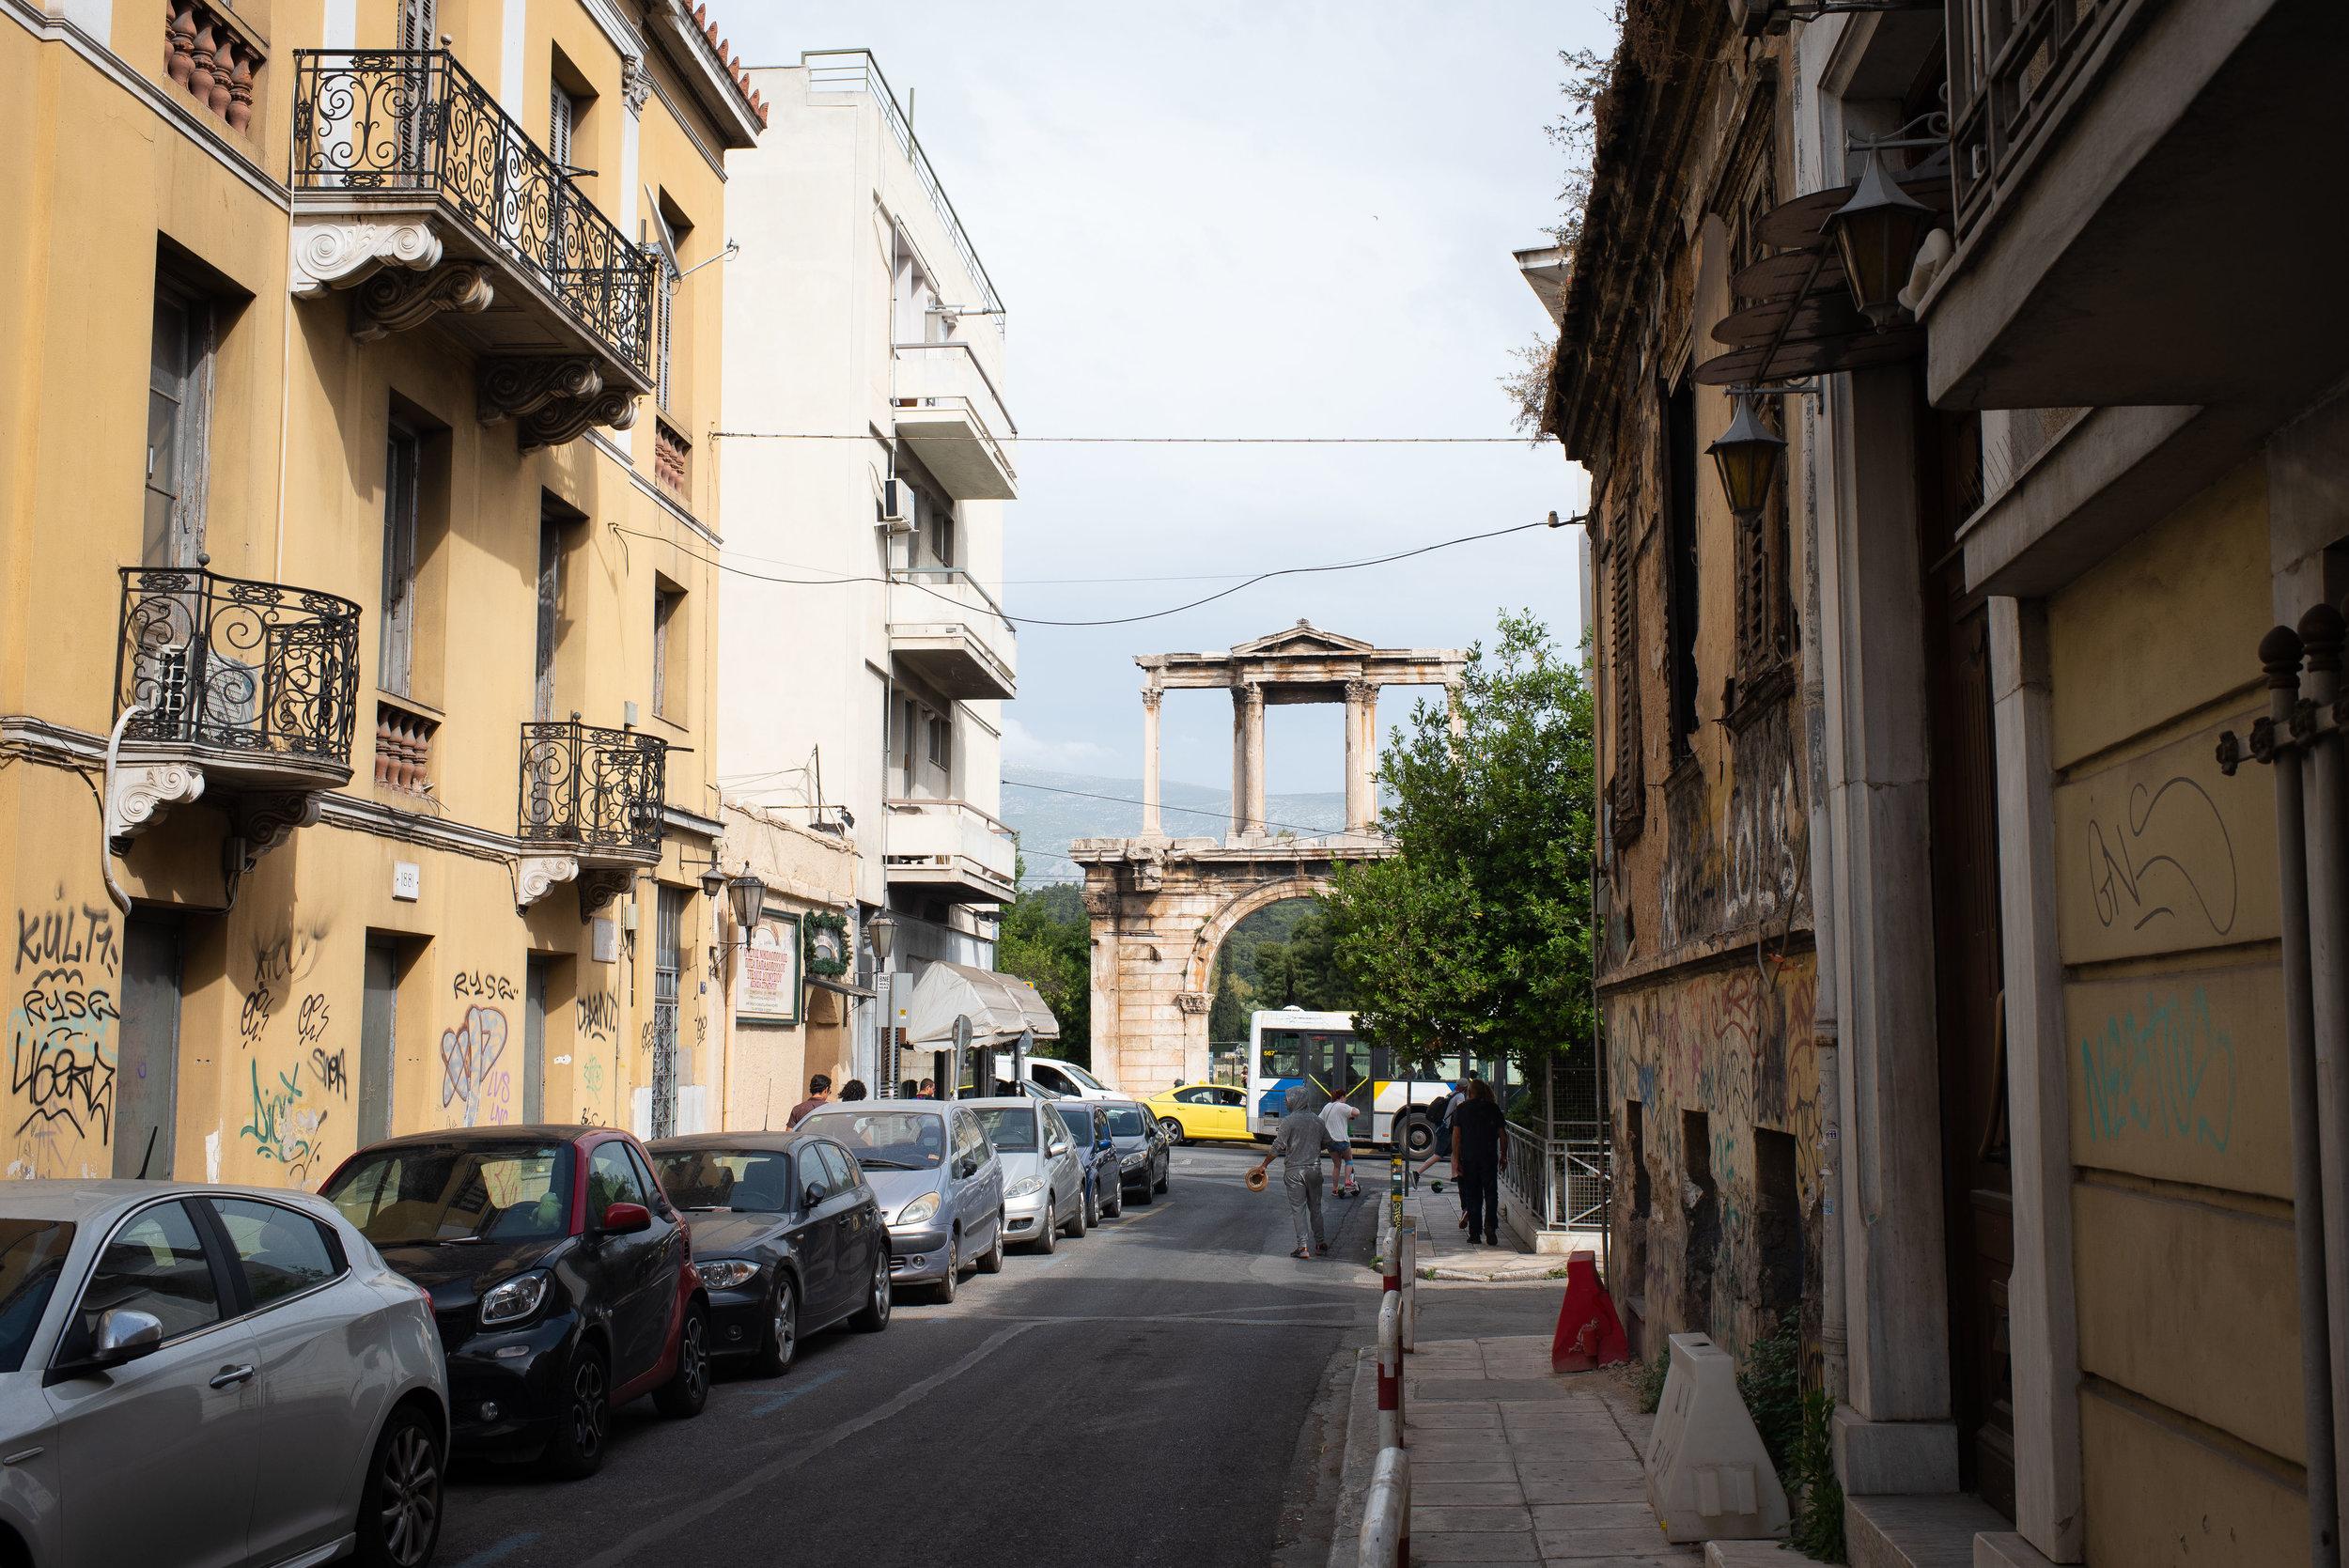 2019-May-14-Athens-Greece-085.jpg